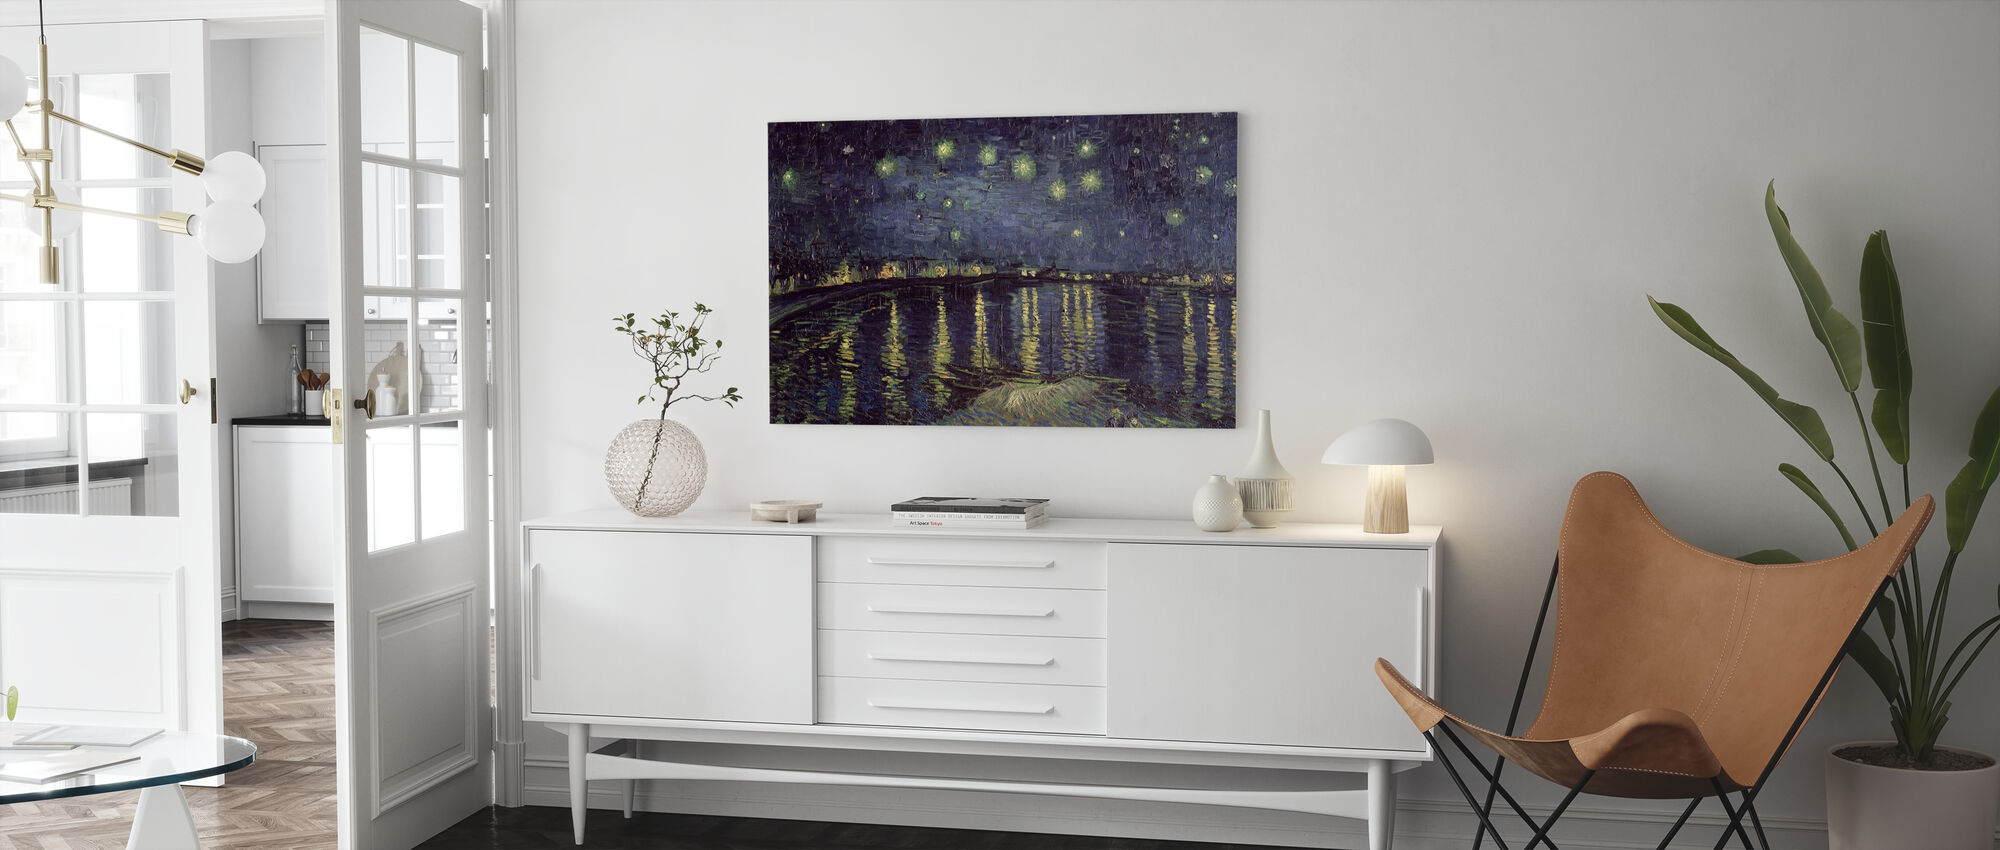 Starry Night - Vincent van Gogh - Canvas print - Living Room